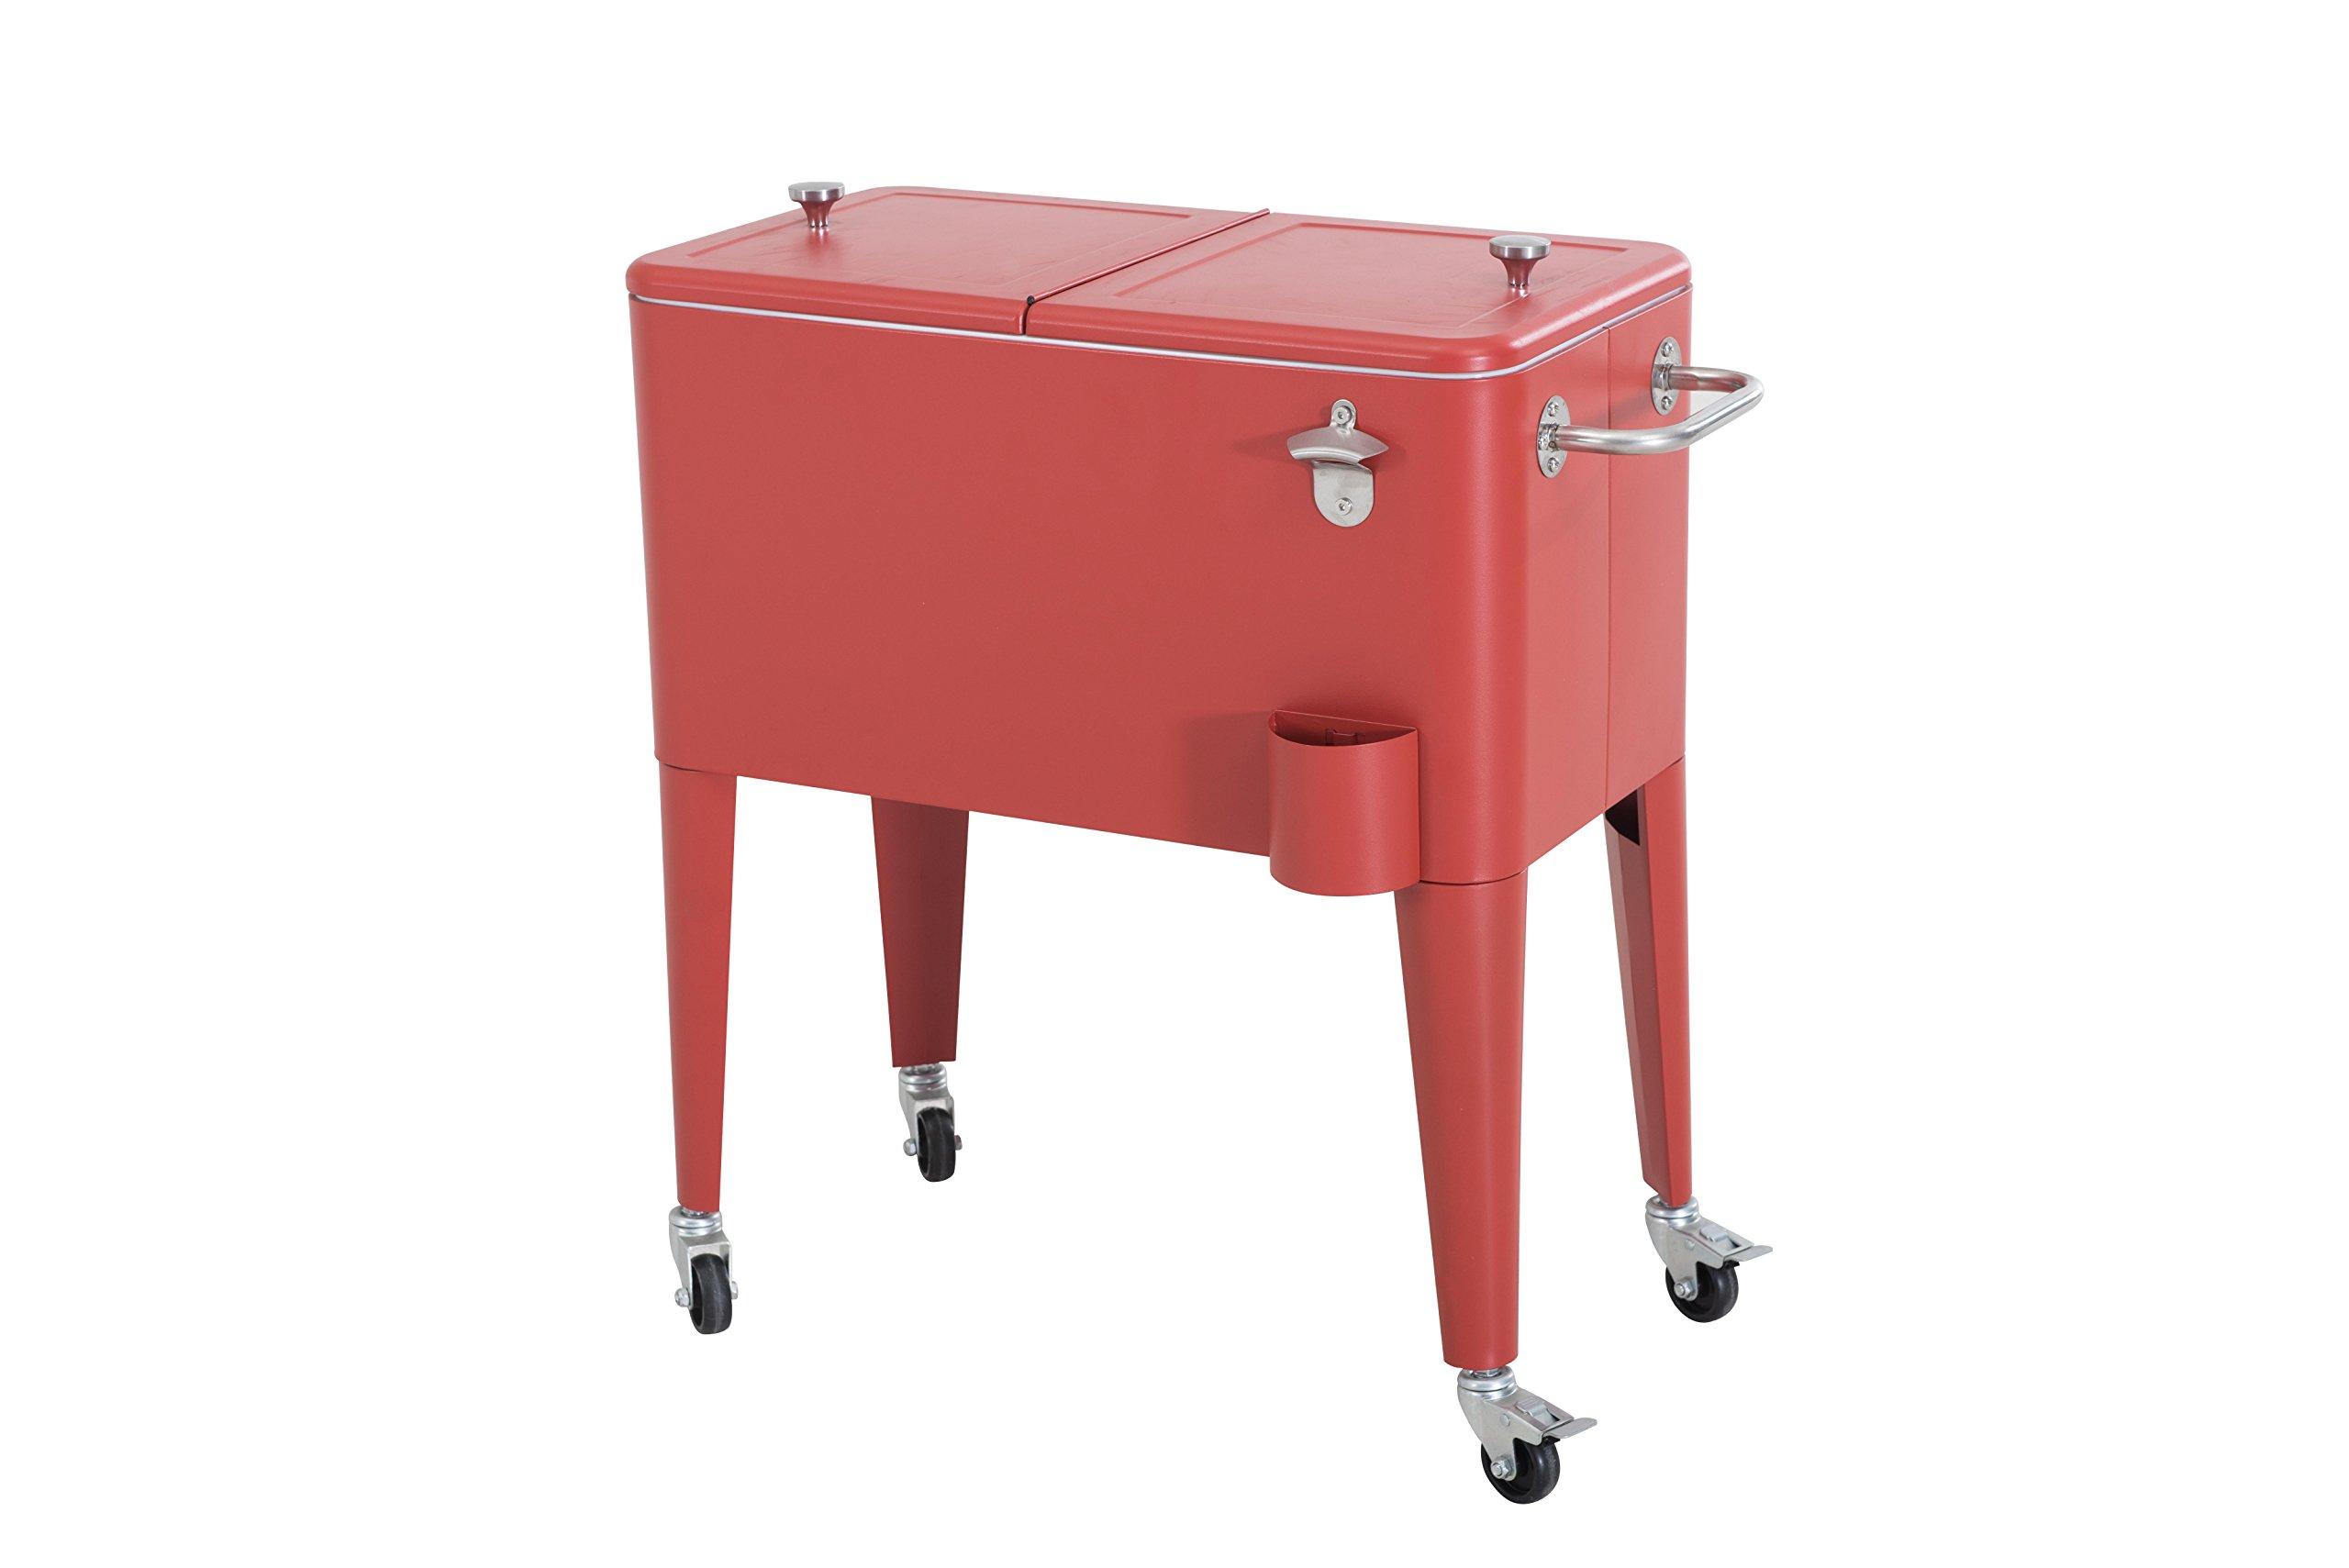 Sunjoy L-BC153PST 60 quart Wheeled Beverage Cooler in Red by sunjoy (Image #3)